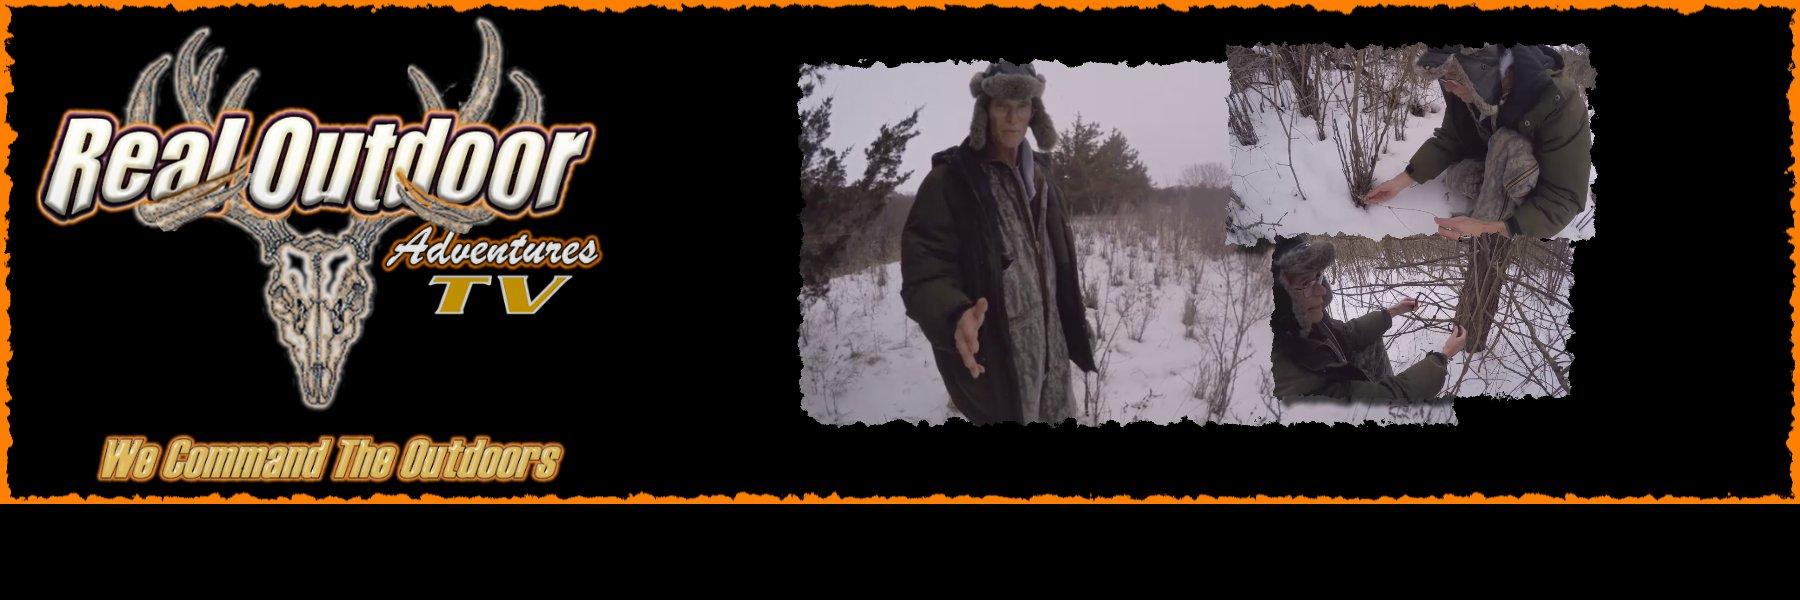 Bruce Buckshot Hemming - Rabbit Snare Trappings Basics